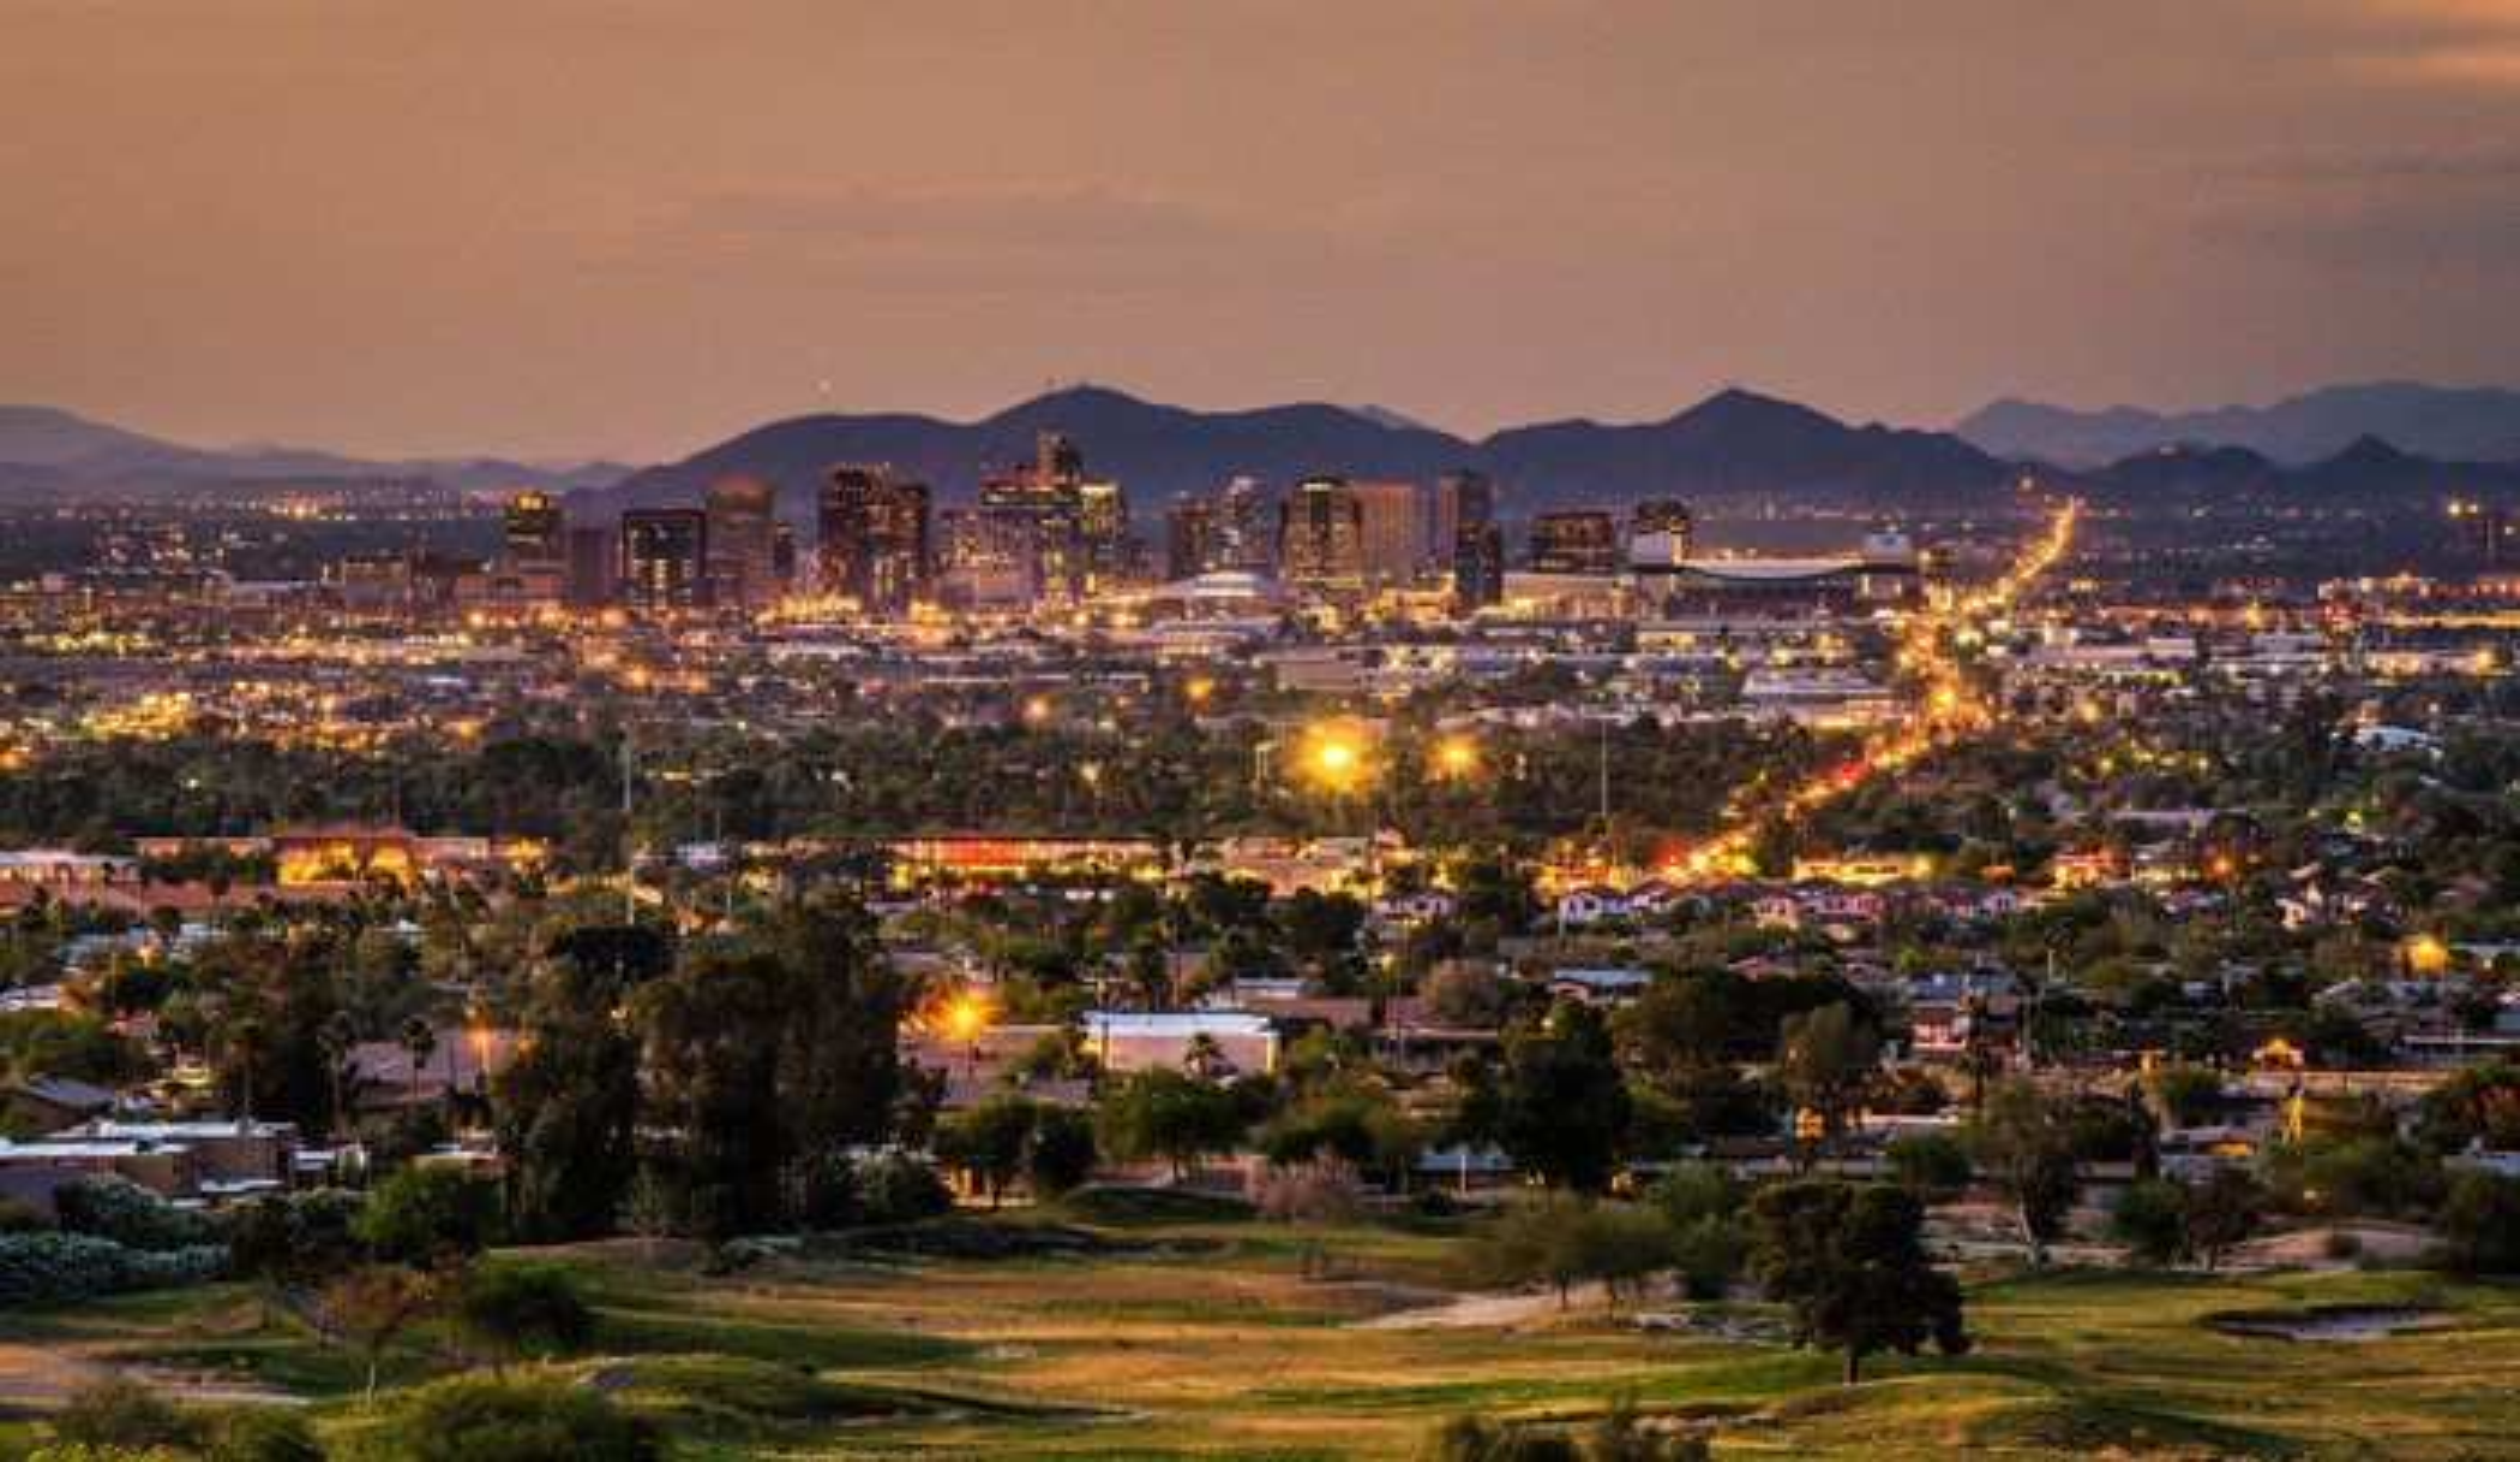 Phoenix, Arizona at dusk.